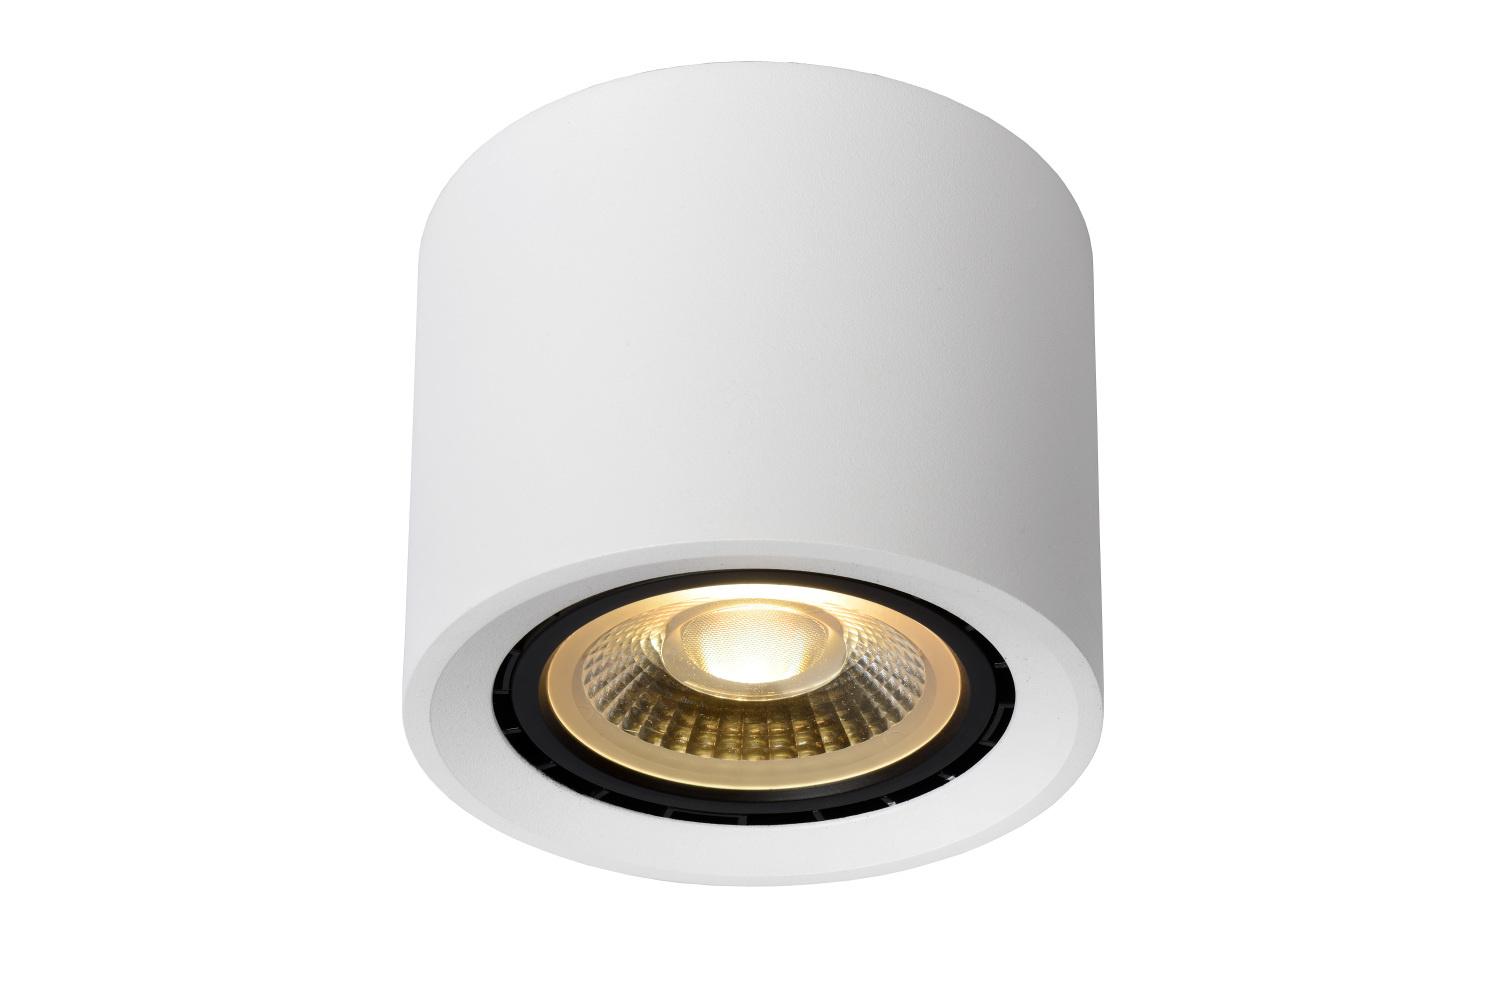 Lucide FEDLER Plafondspot-Wit-Ø12-LED DTW-1xGU10-12W